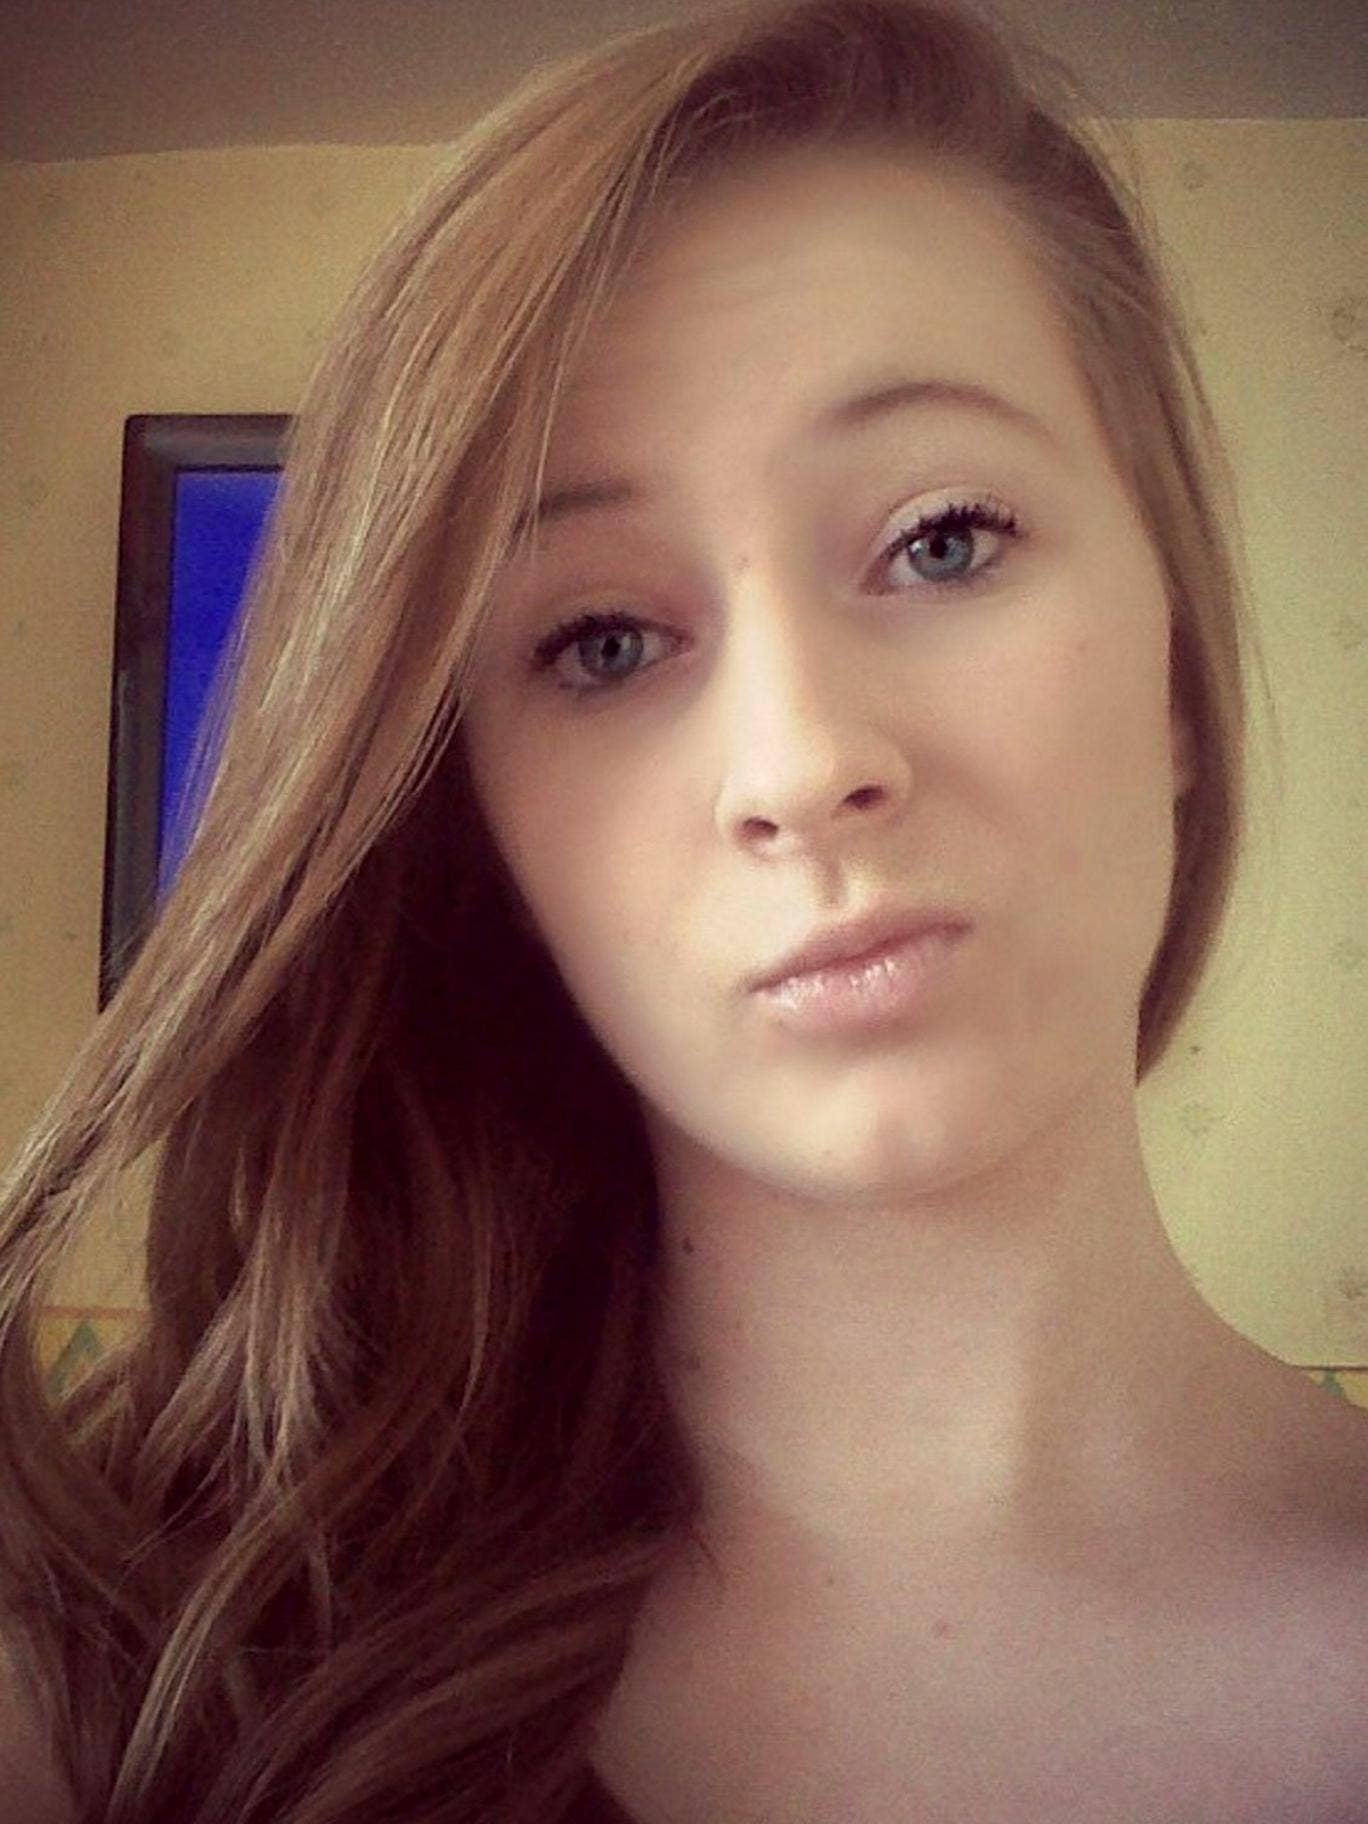 16-year-old schoolgirl Christina Edkins